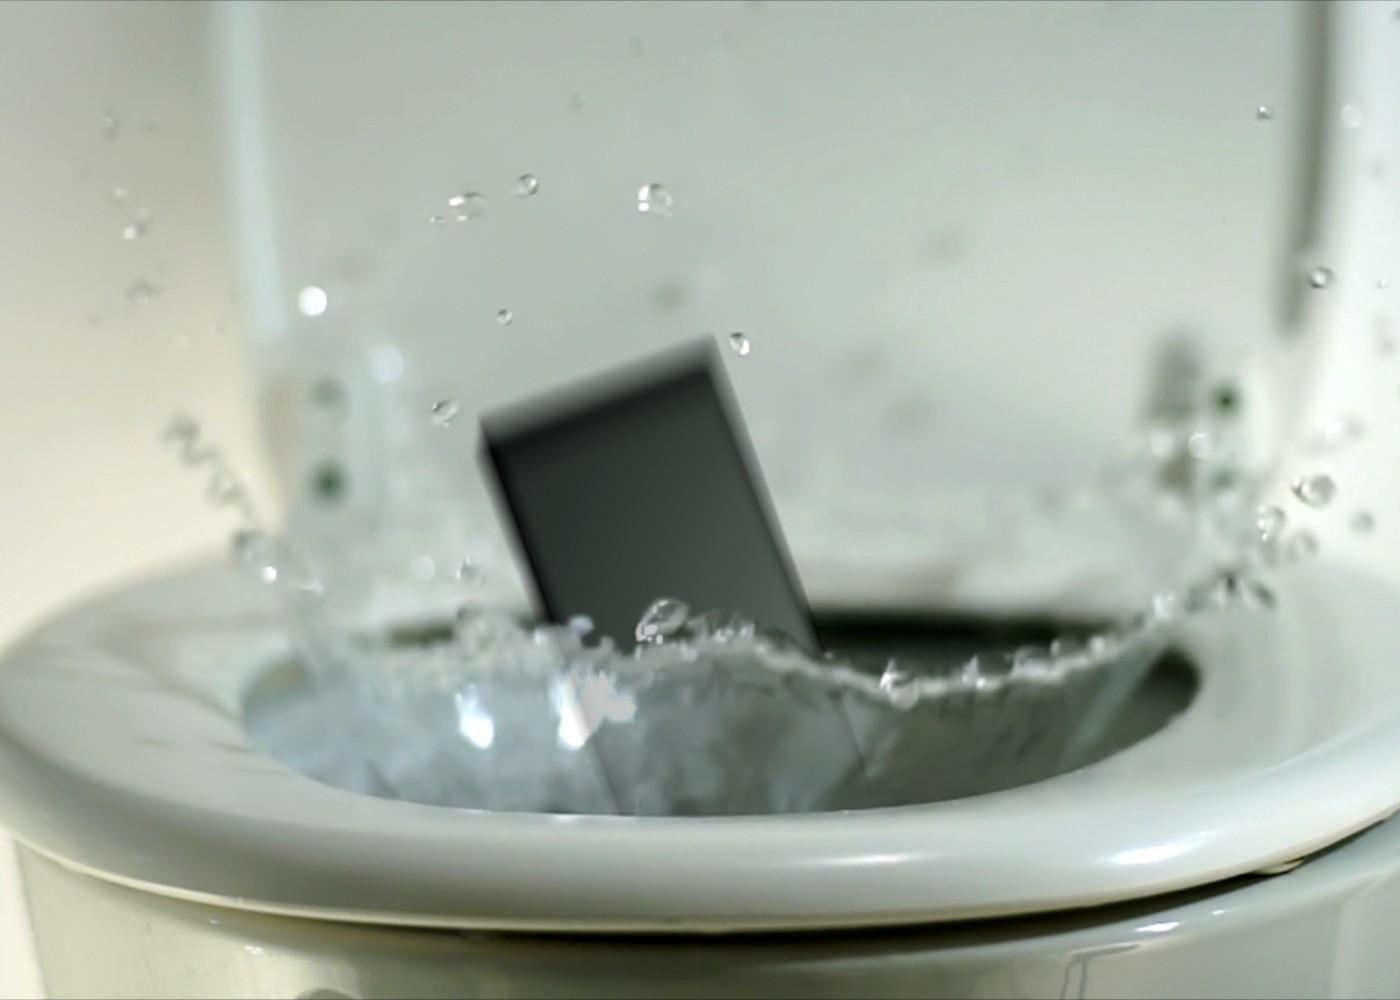 telefone a cair na sanita